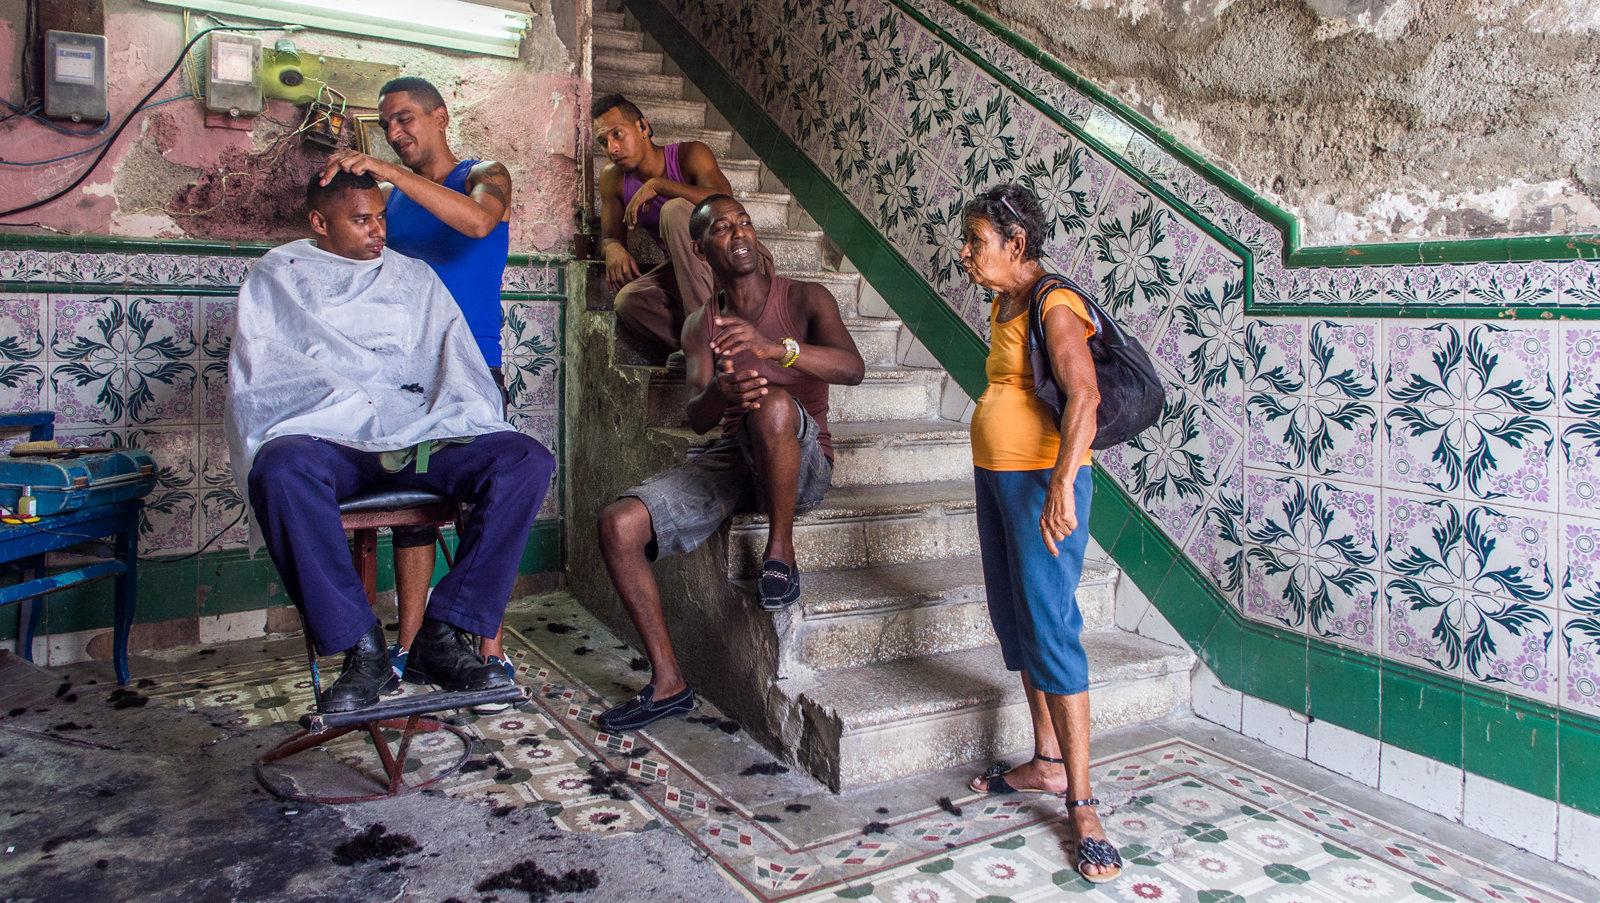 05_Cuba_2014_Erik_Hart_Lensculture_1600px.jpg